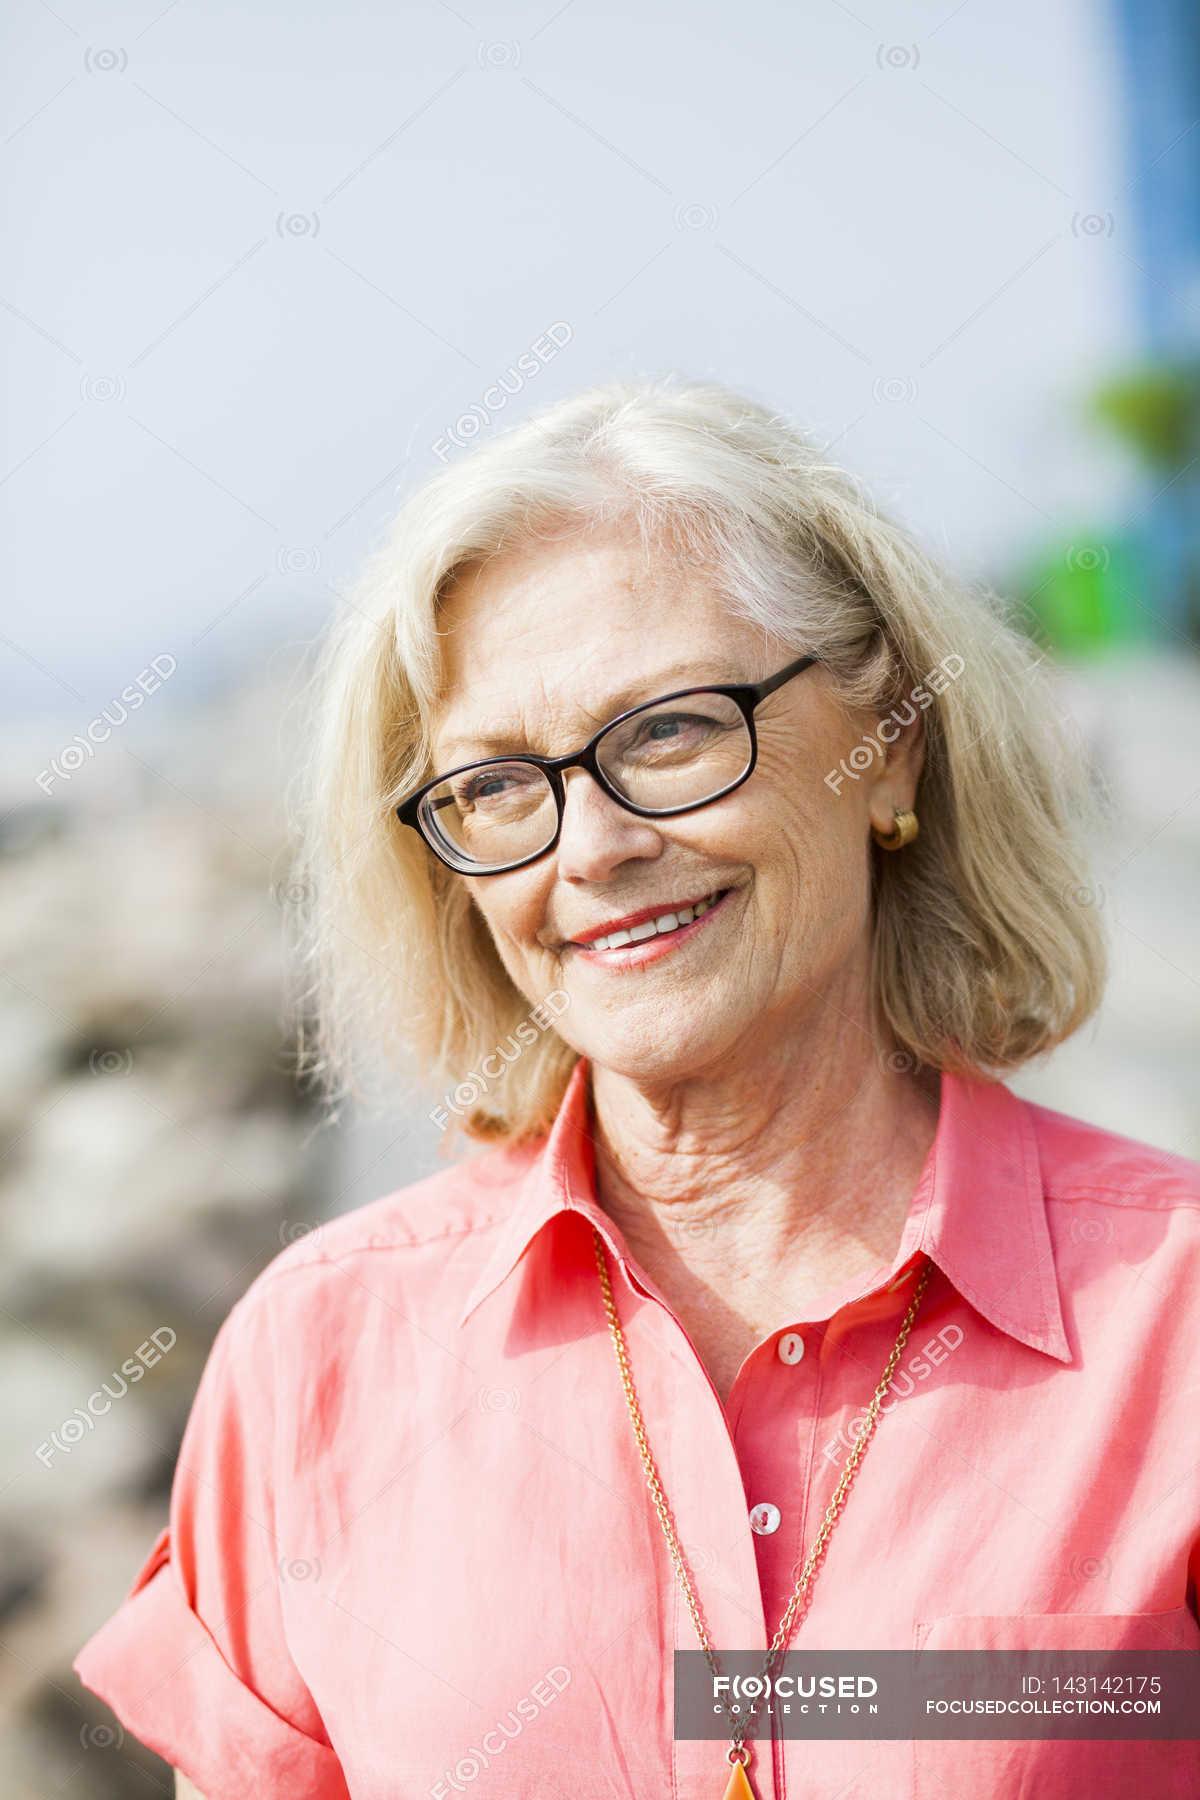 Las Vegas Swedish Senior Online Dating Service